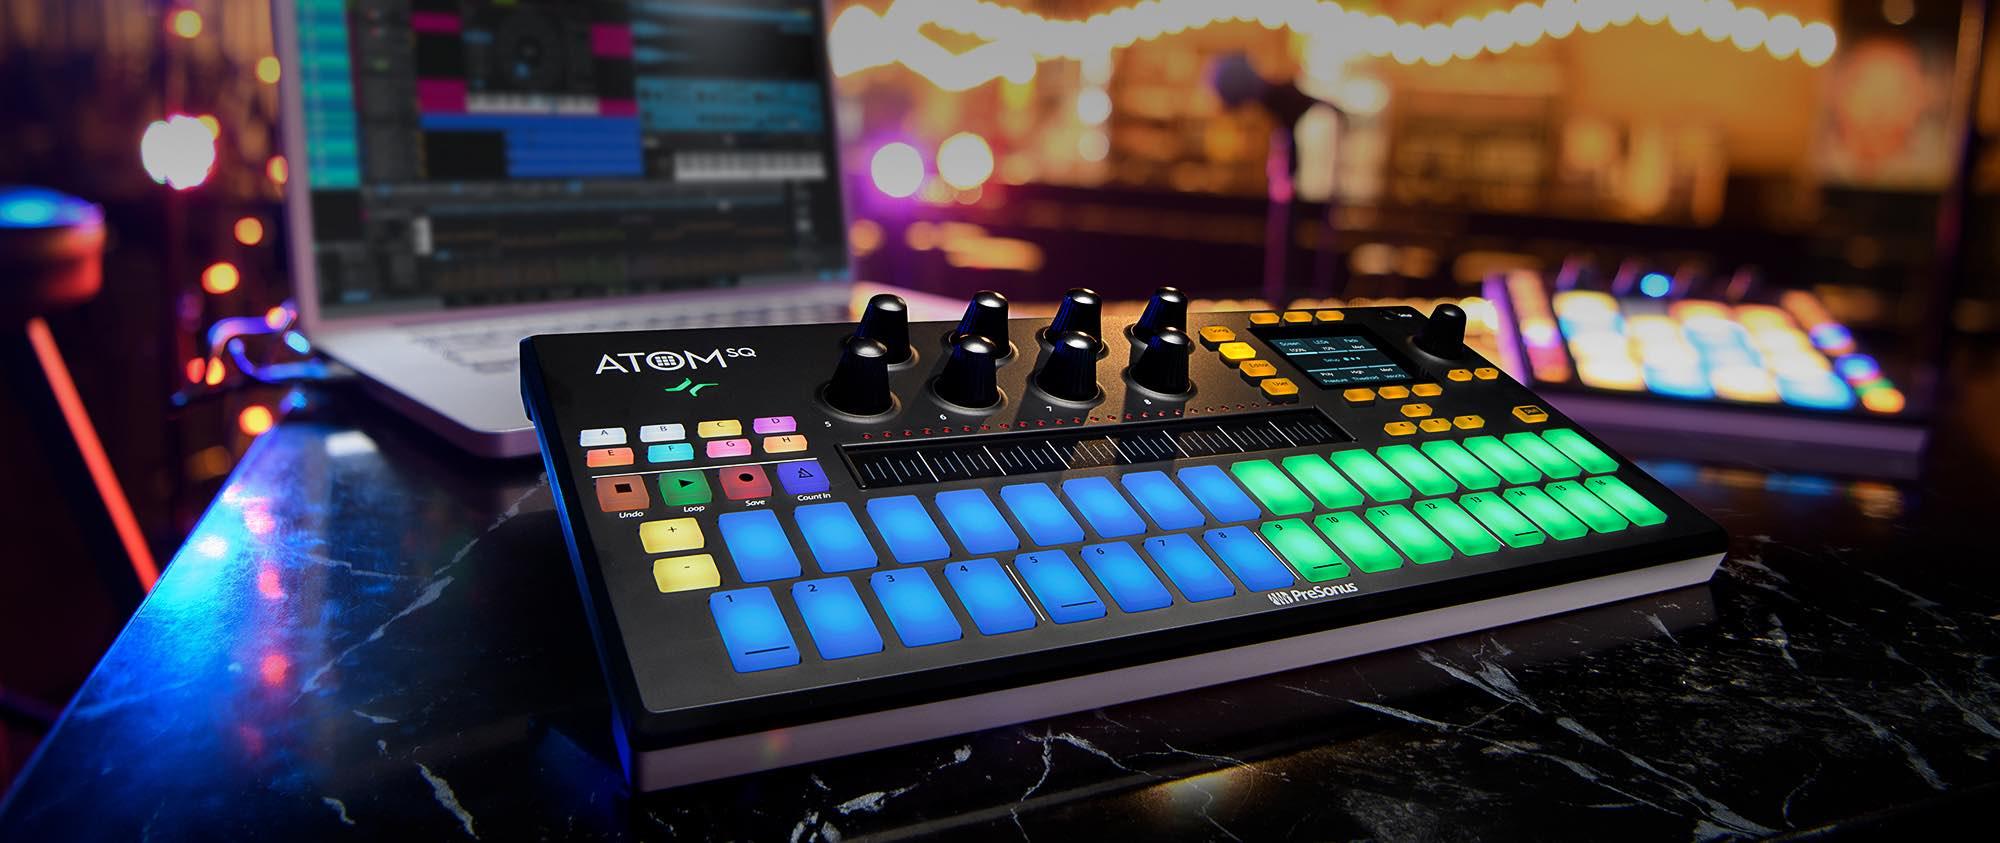 PreSonus Atom SQ controller hardware midi producer midi music performance performer live dj ableton studio one strumenti musicali